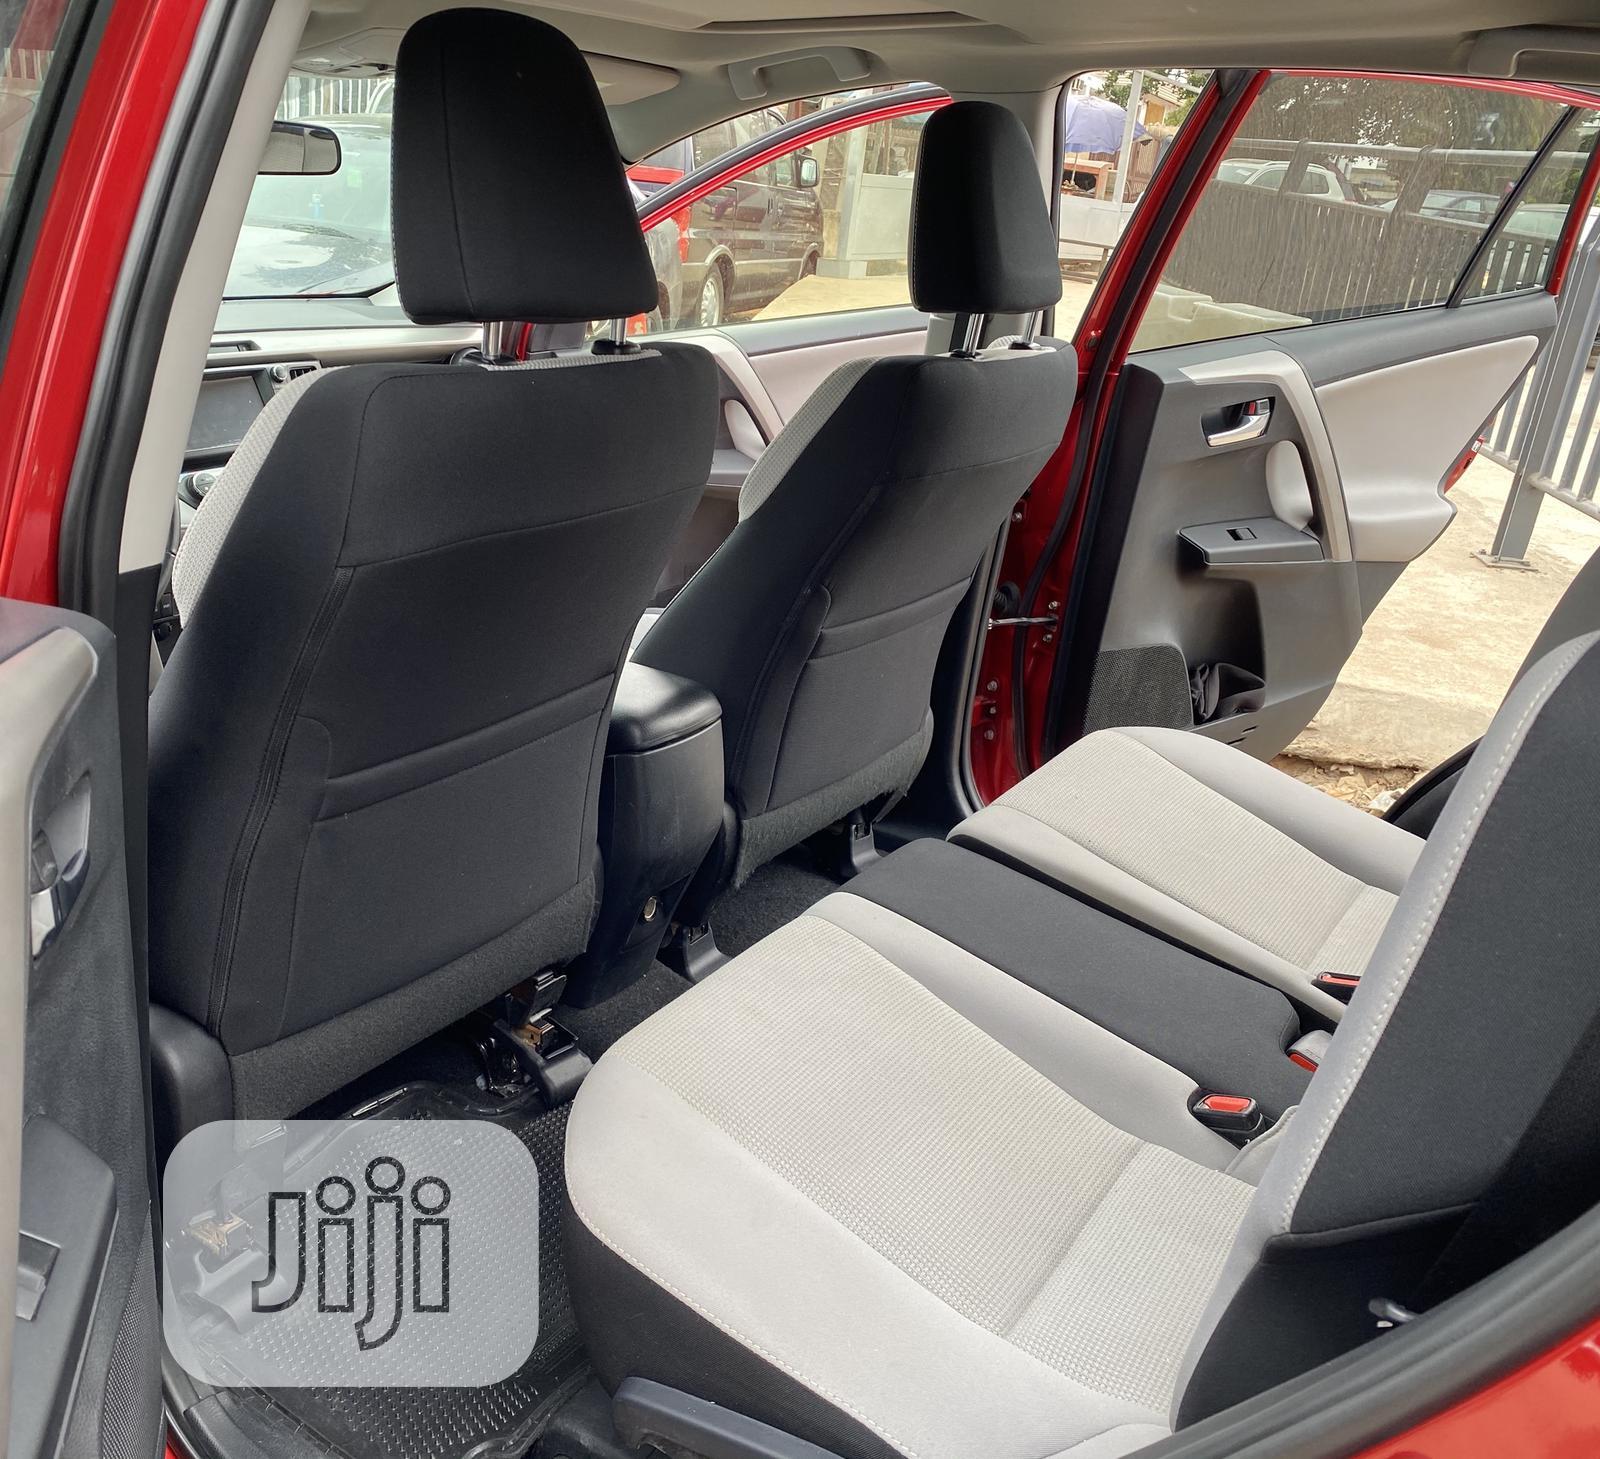 Toyota RAV4 2016 XLE AWD (2.5L 4cyl 6A) Red   Cars for sale in Ojodu, Lagos State, Nigeria